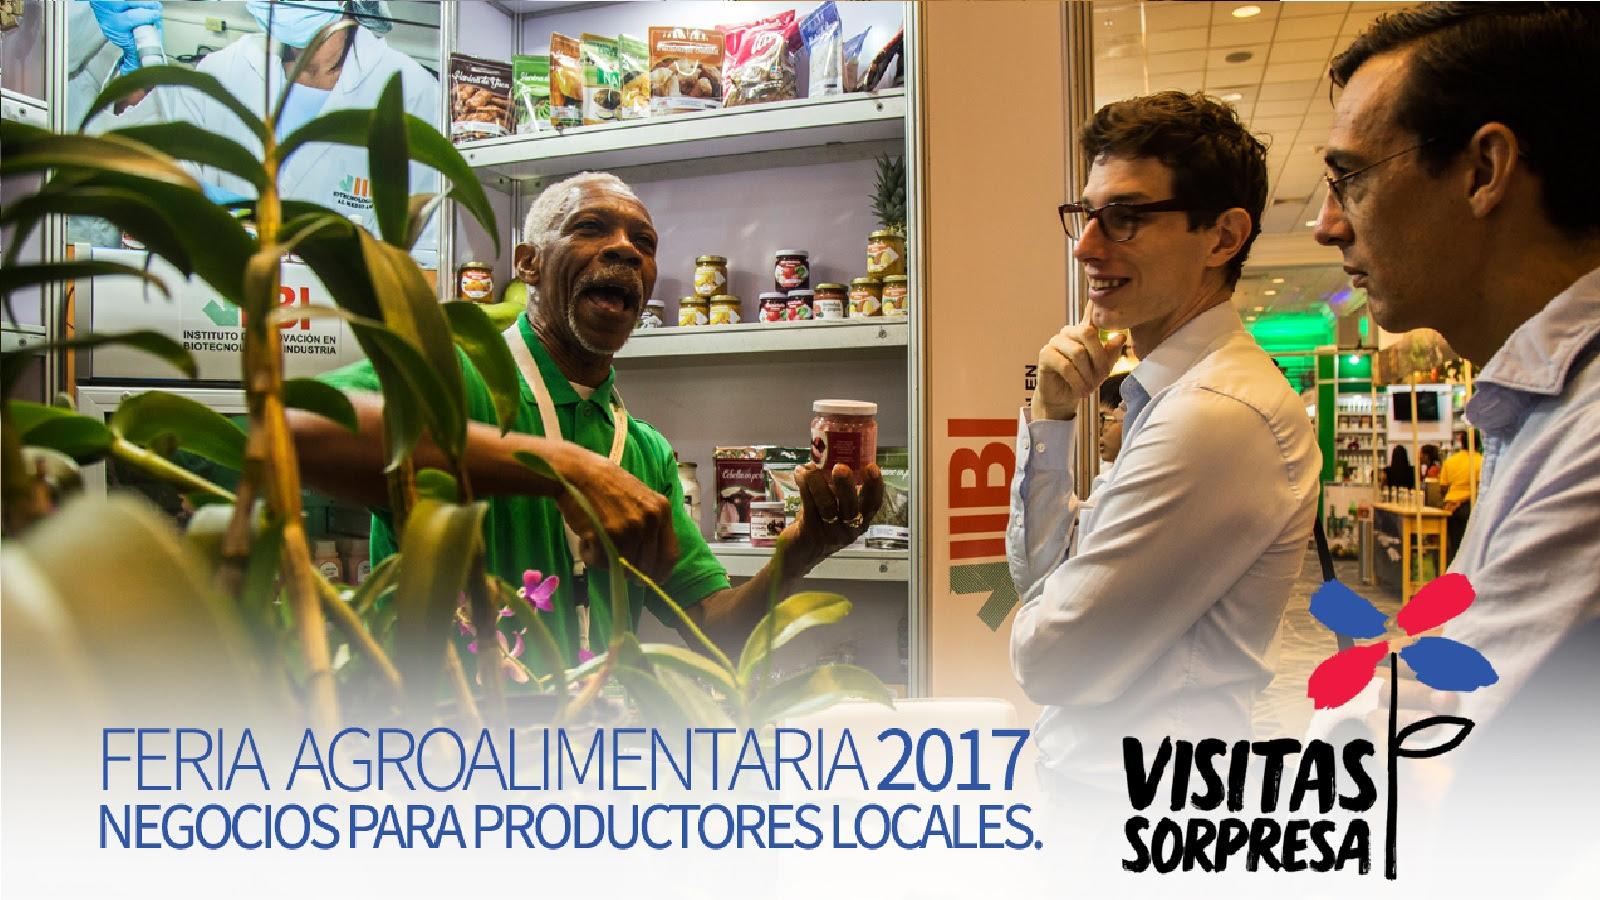 VIDEO: Feria Agroalimentaria 2017: negocios para productores locales